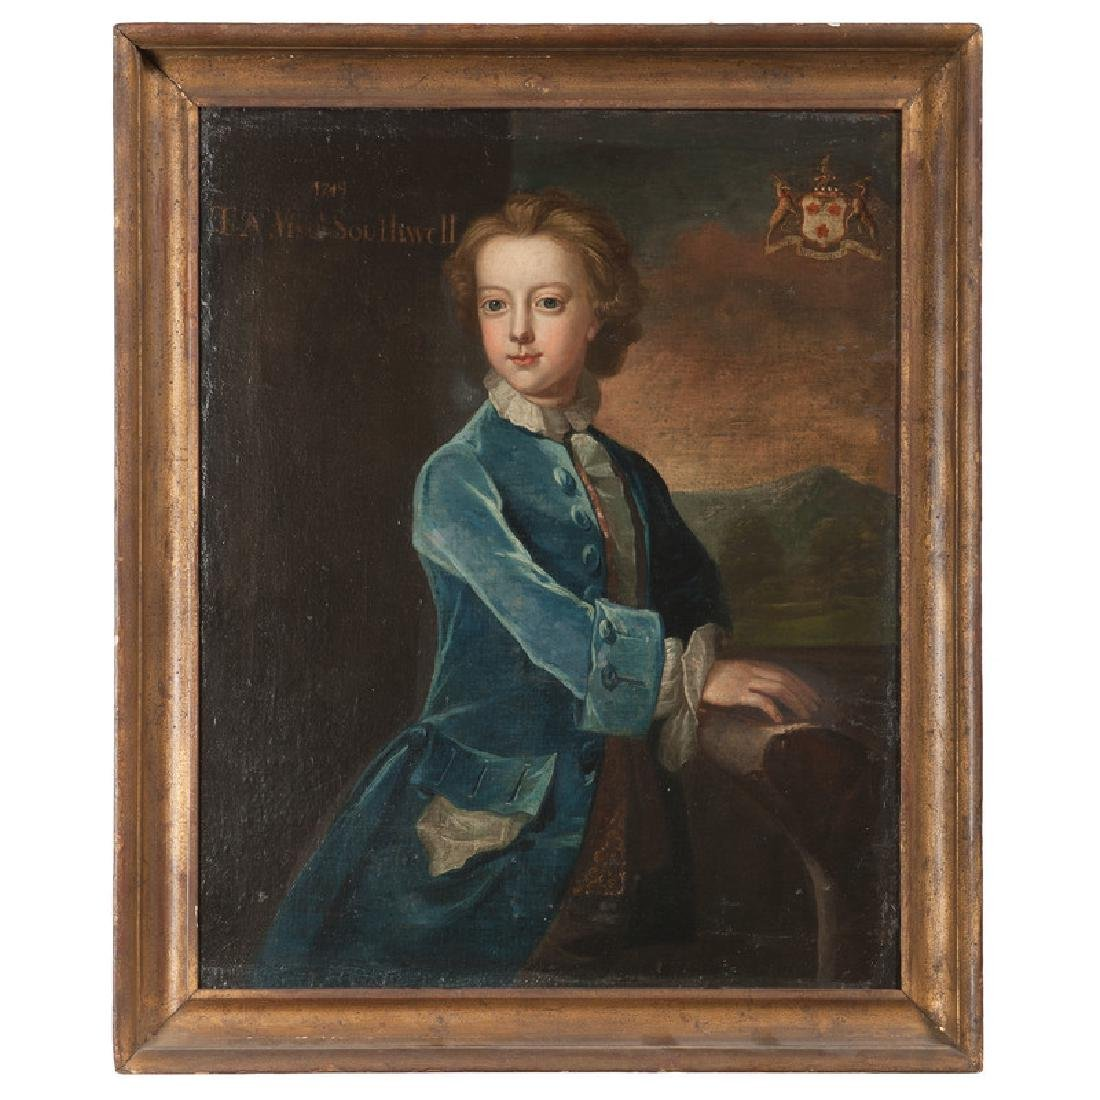 Irish School, 18th century, Portrait of Thomas